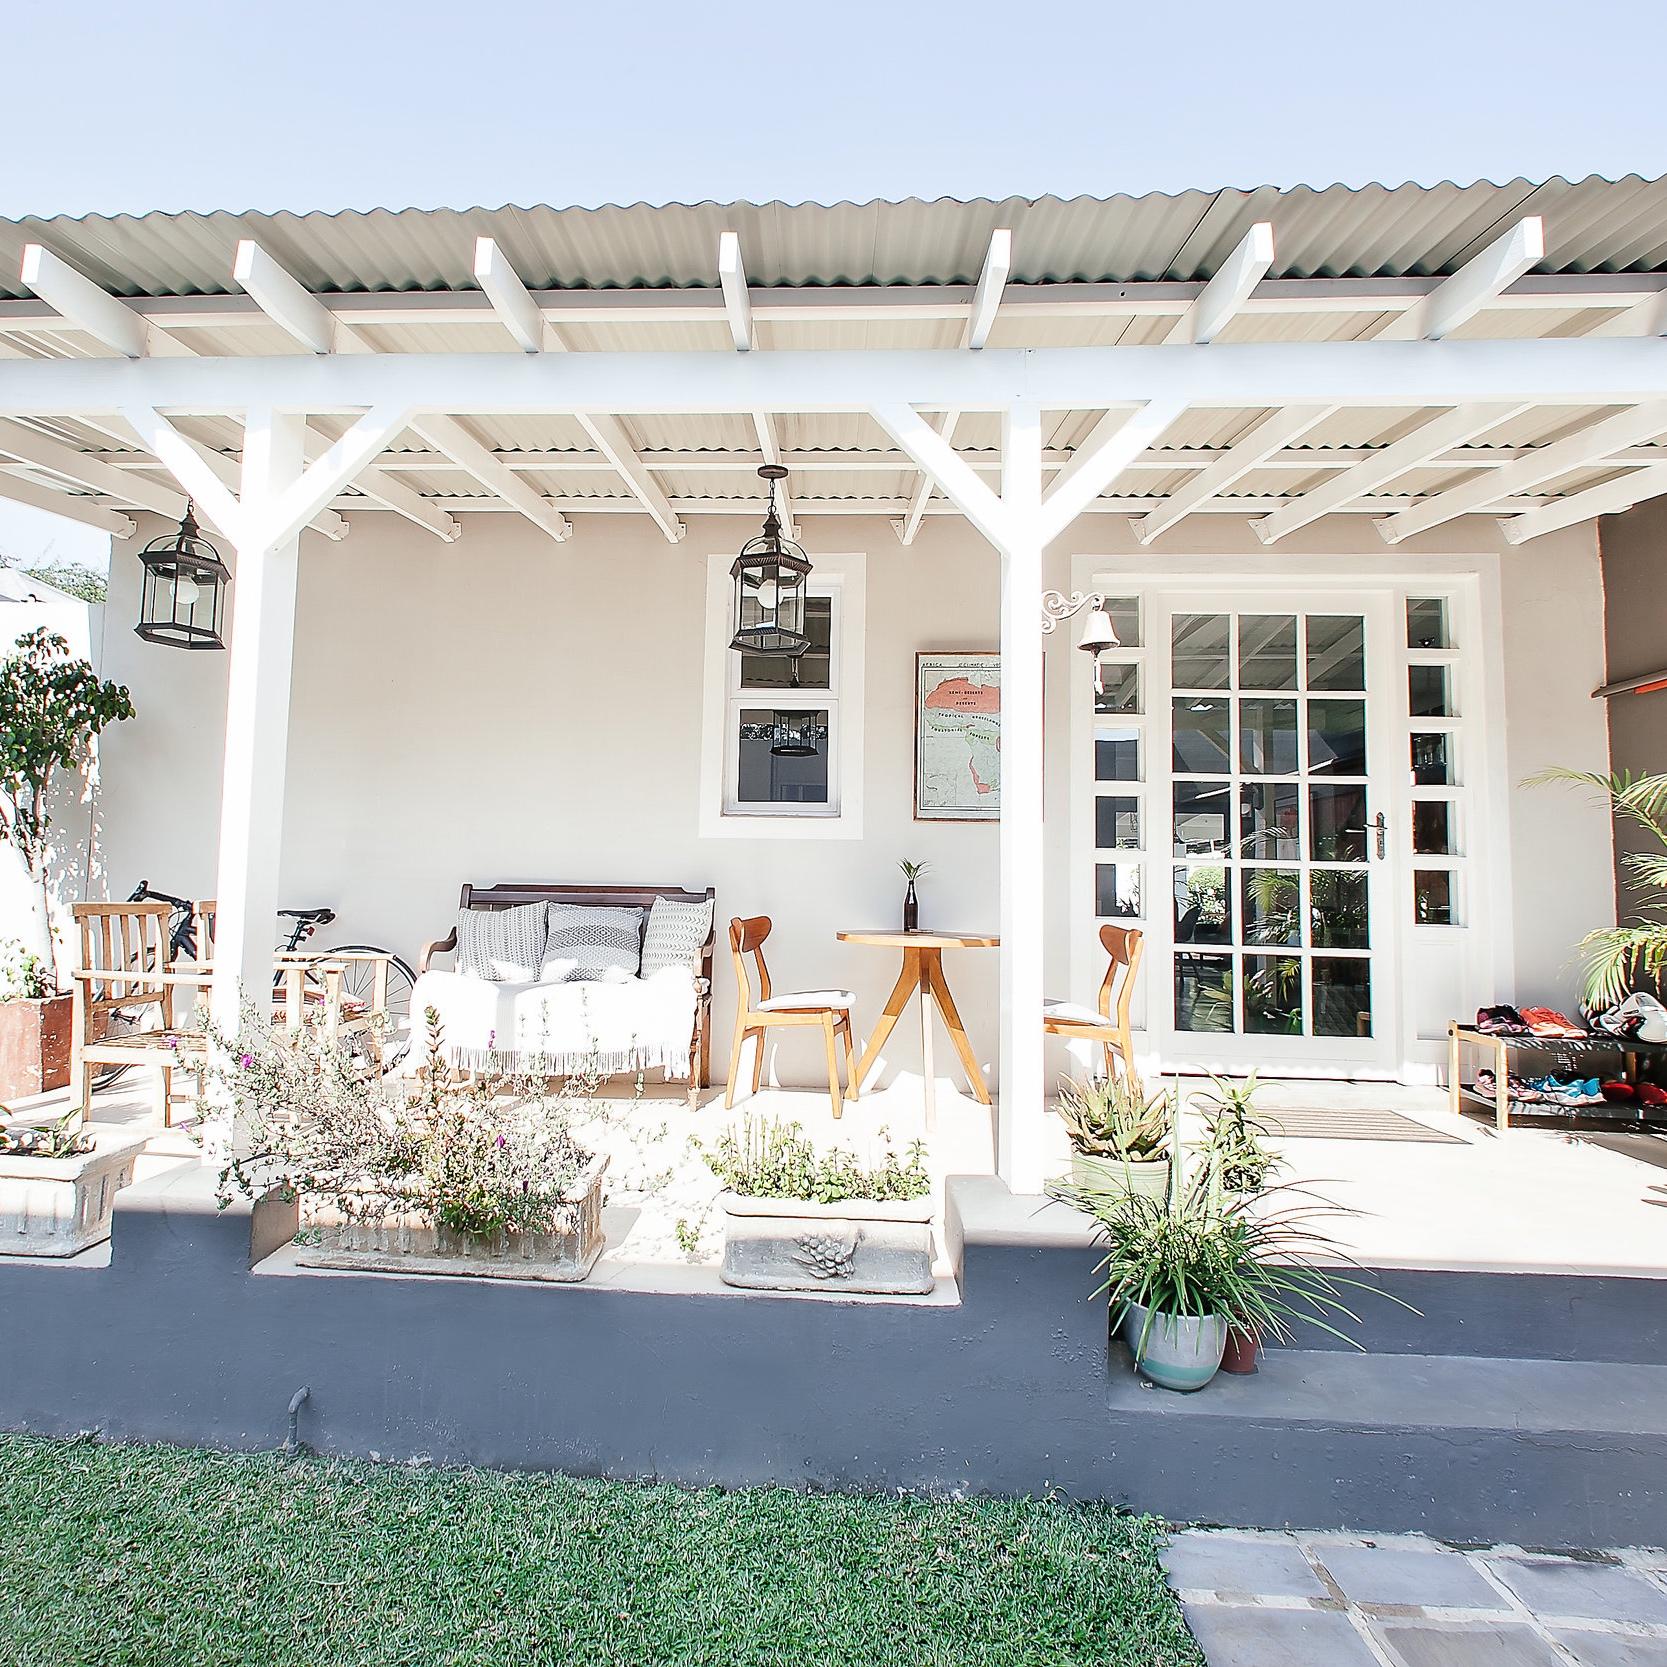 luxury houses in Johannesburg